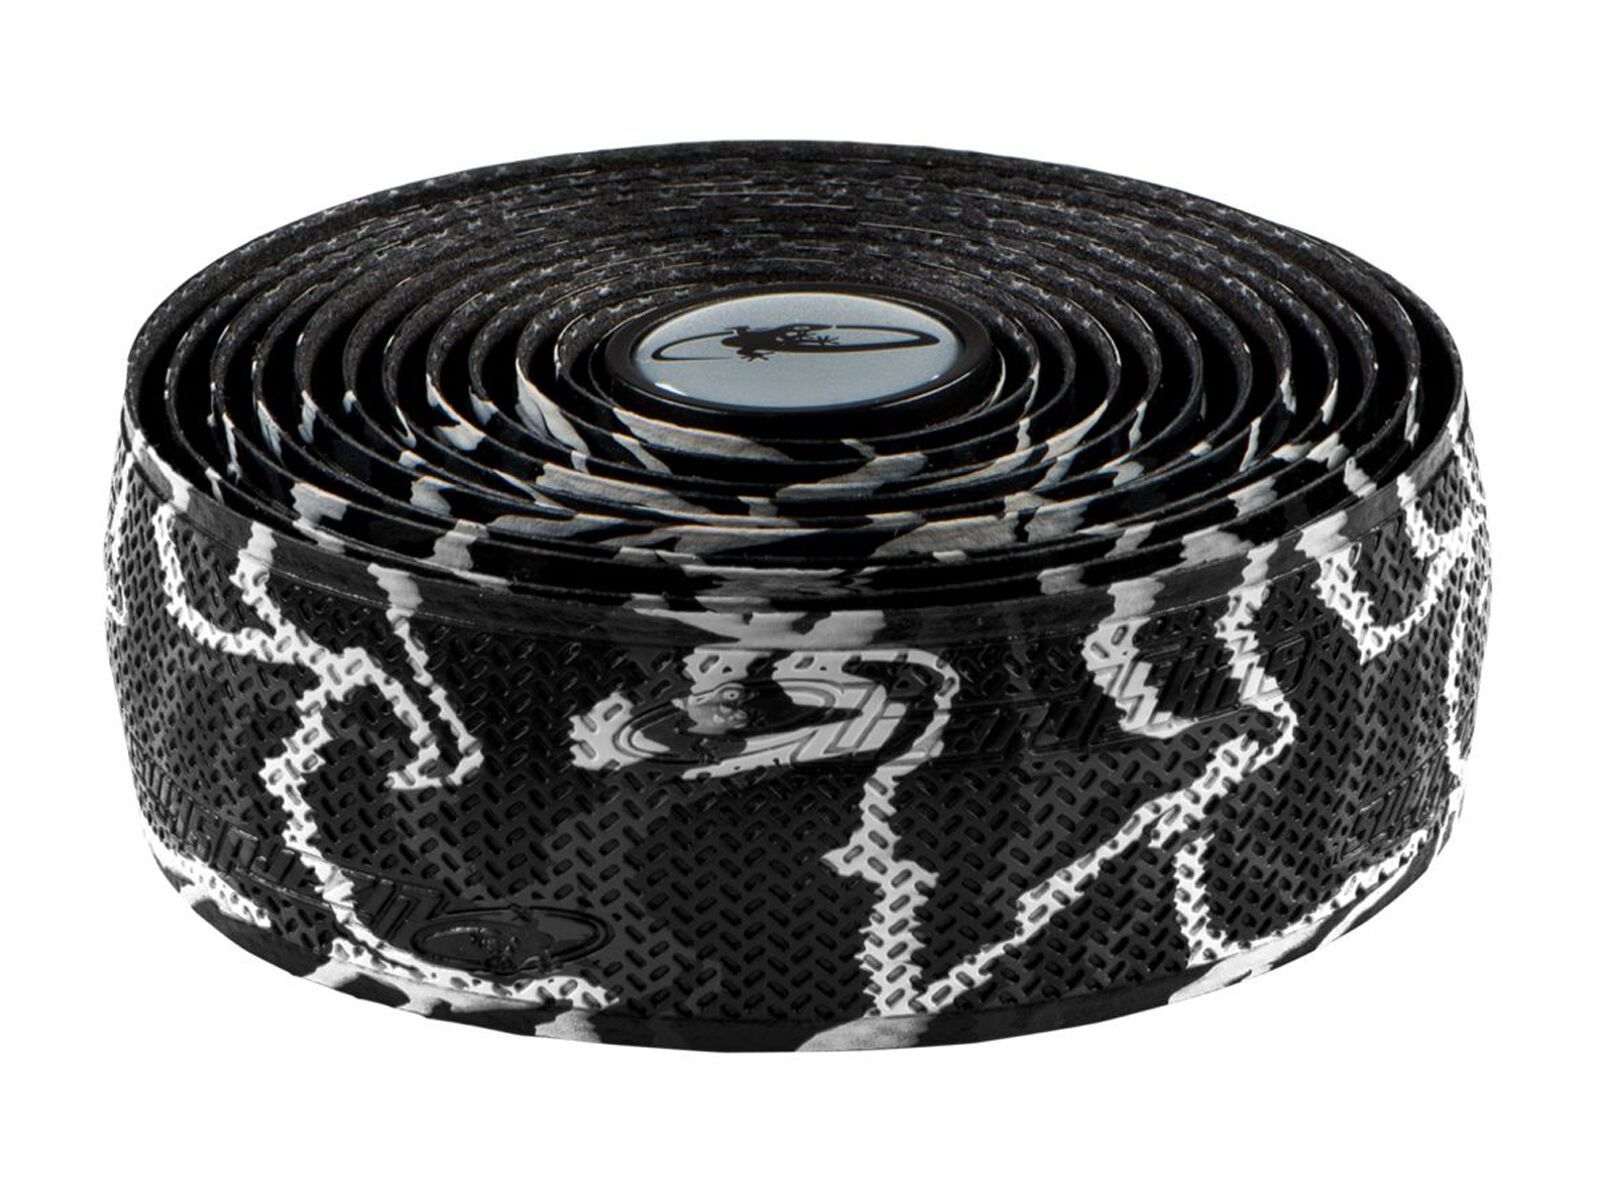 Lizard Skins DSP Bar Tape V2 - 1,8 mm black camo DSPCY111